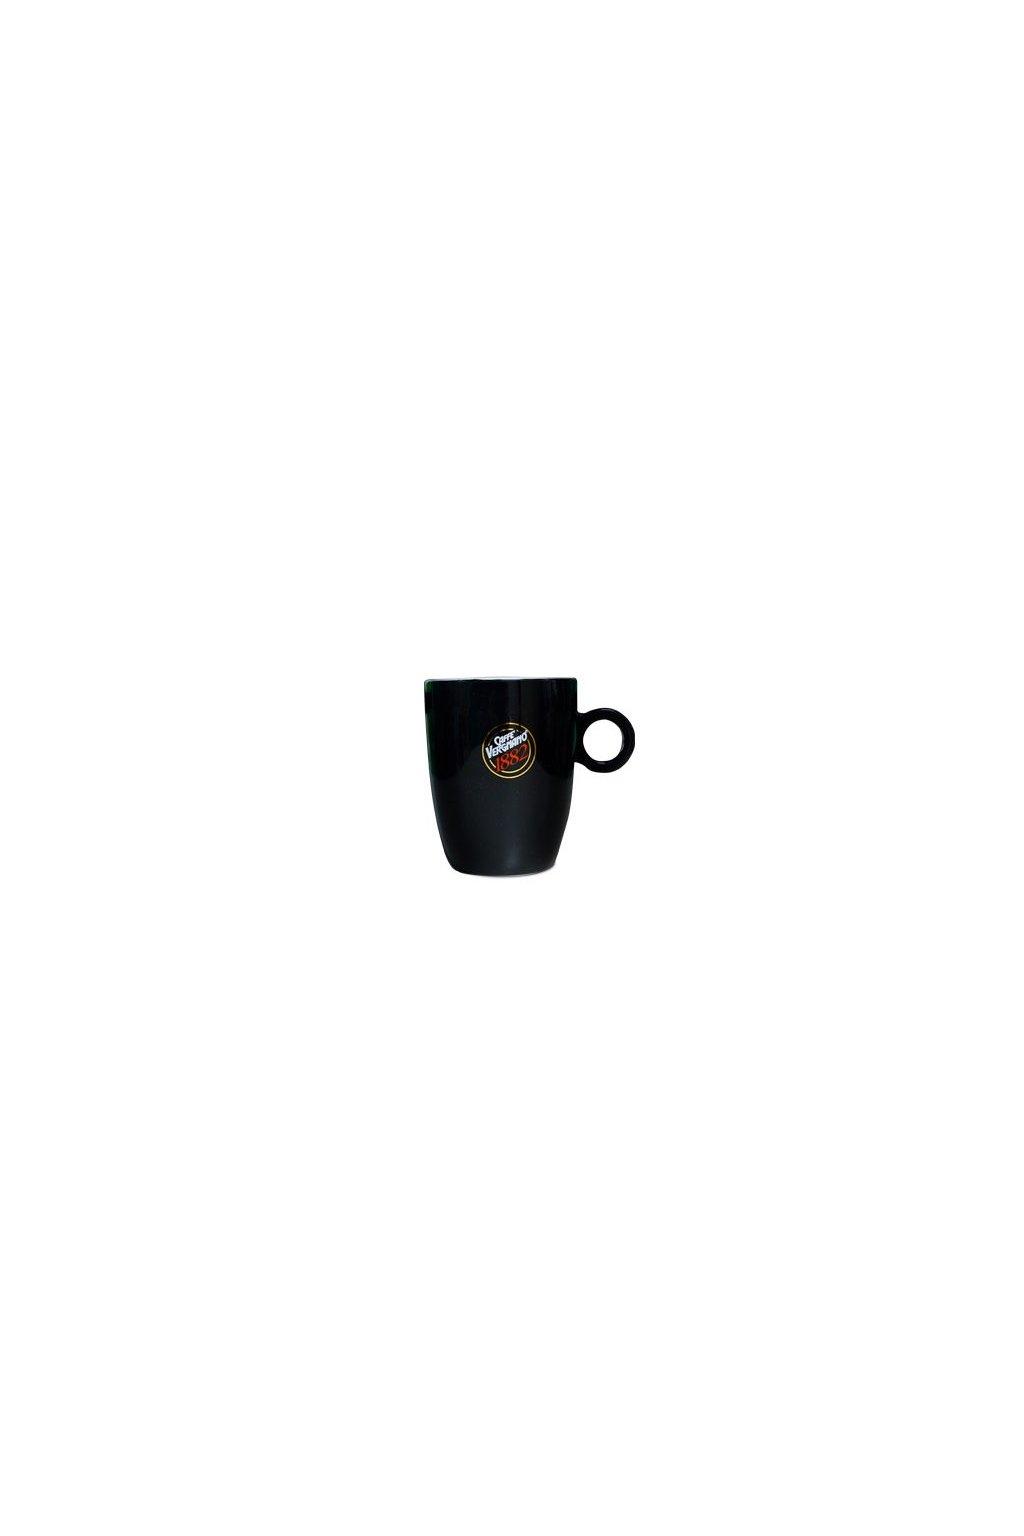 linea 1882 mug e1493733026510